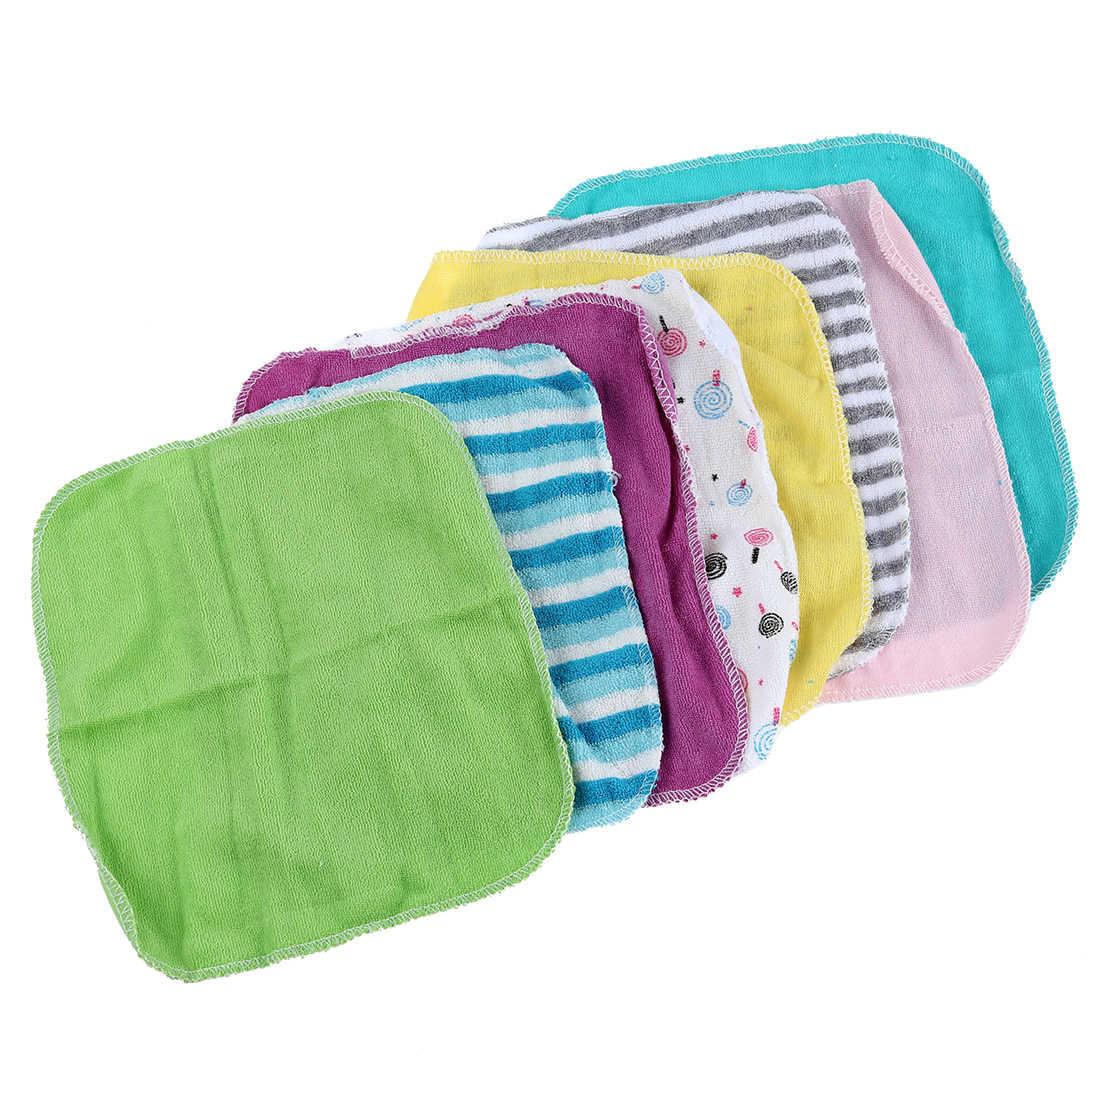 Blue AFFE 2pcs Baby Face Towels Cute Little Bear Soft Cotton Washcloths Washing Bath Shower Wipe Nursing